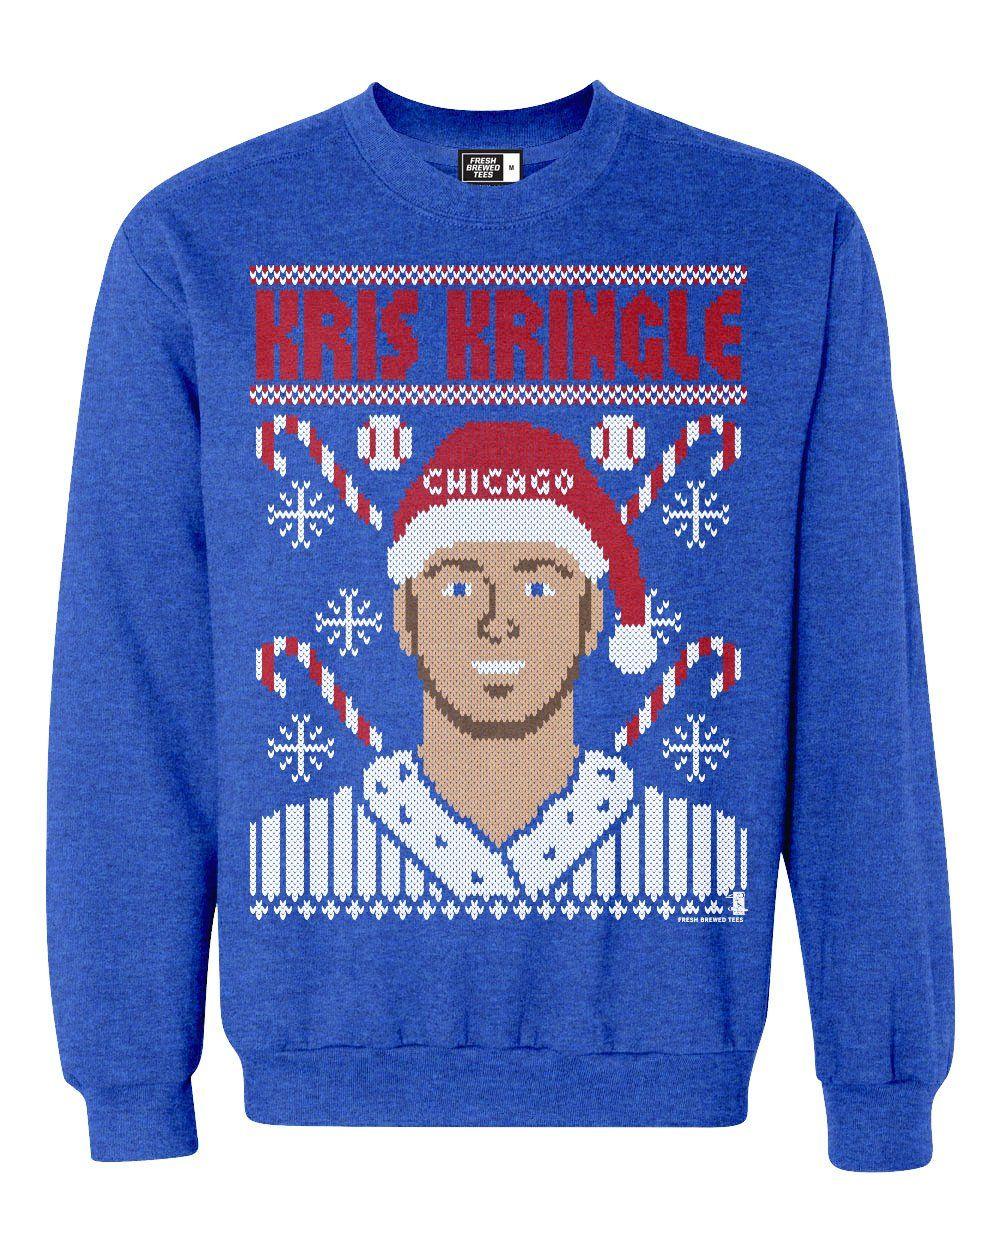 Kris Kringle Bryant Ugly Christmas Sweatshirt  be7cbc156